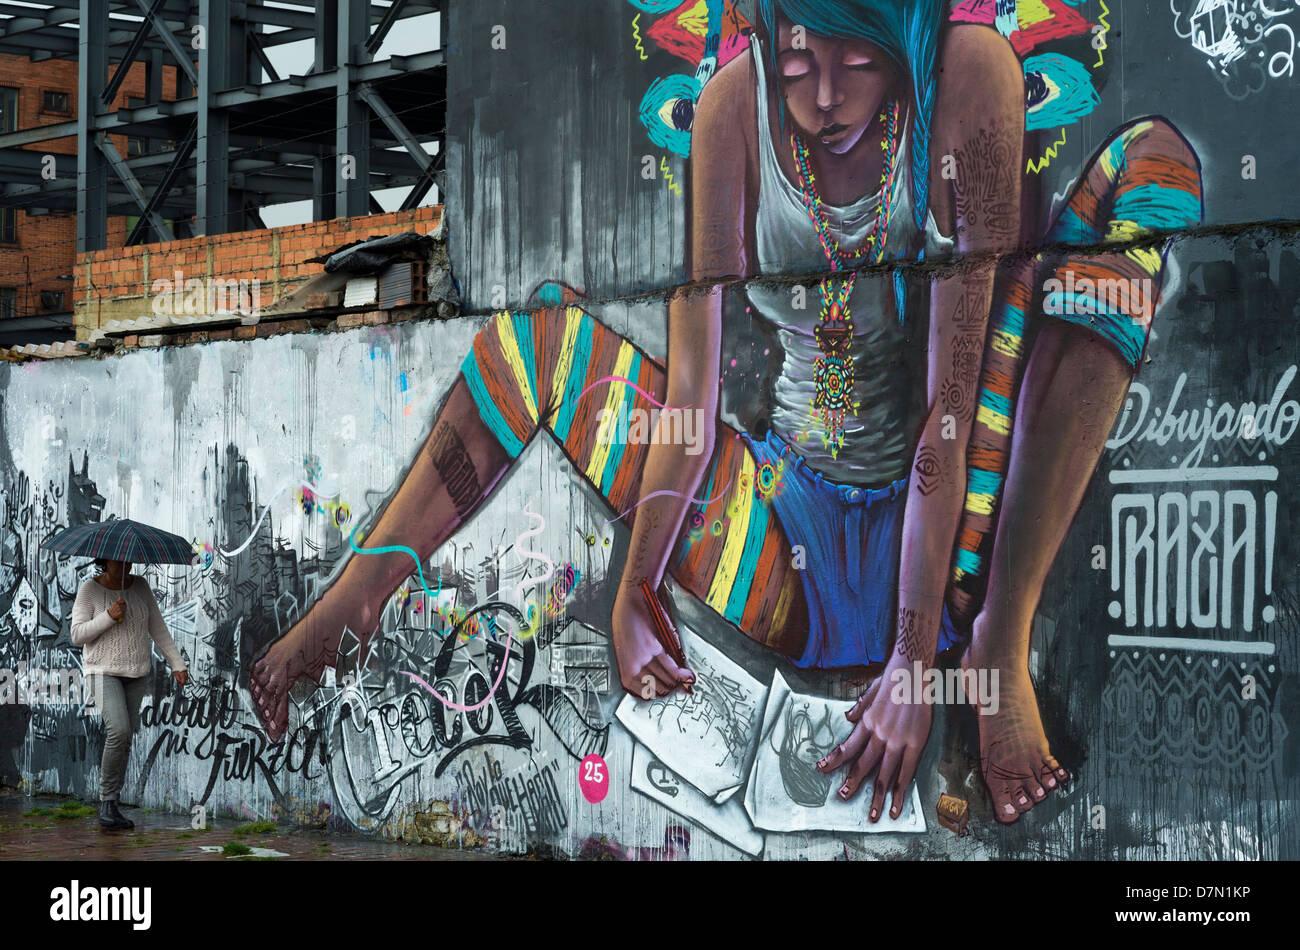 Graffiti (peinture murale), dans la rue à Bogota, Colombie. Photo Stock